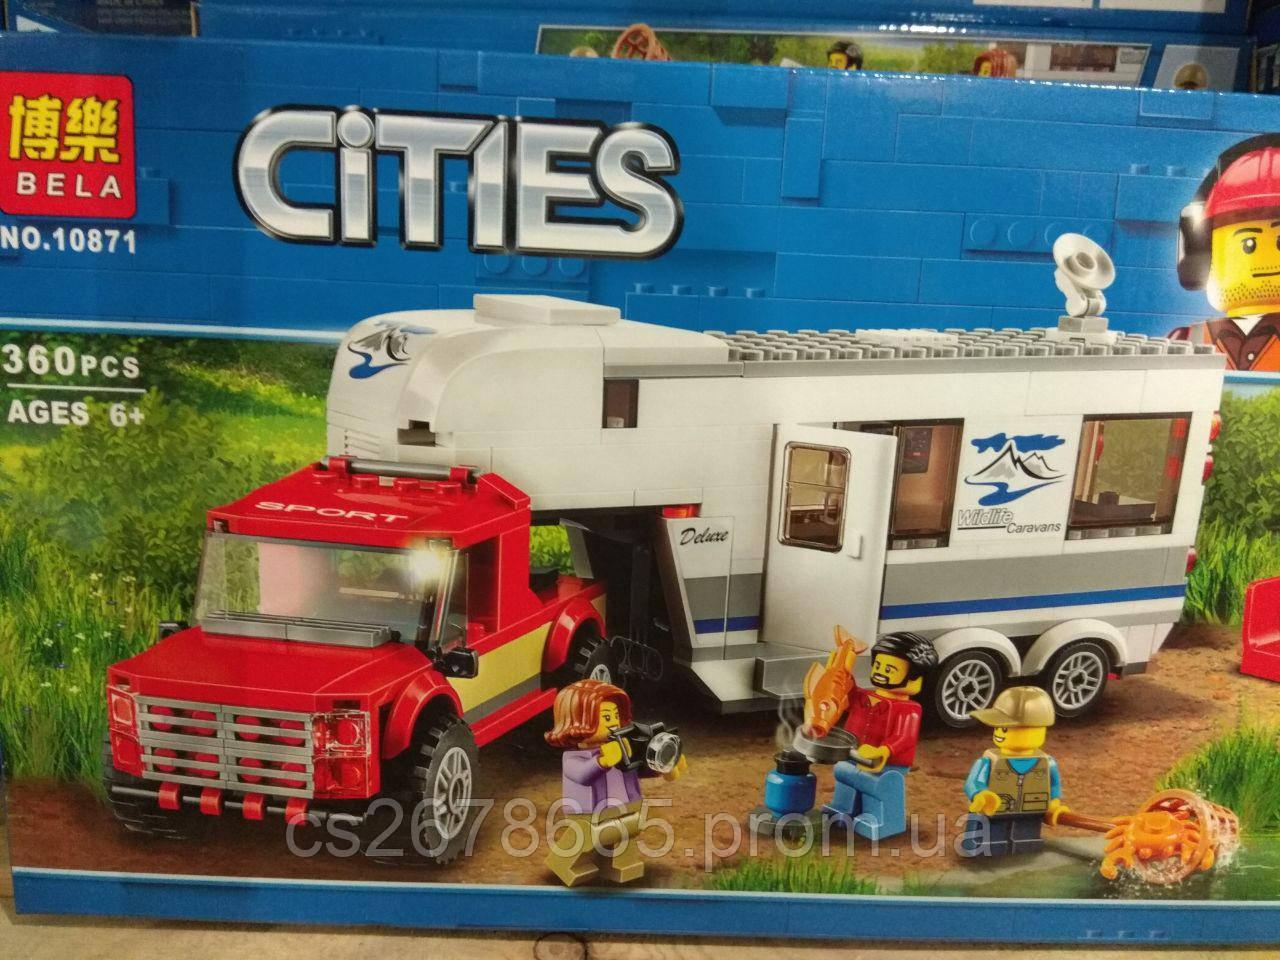 Конструктор CITIES 10871 (аналог Lego City 60182) «Пикап и фургон, дом на колесах» 360 дет.